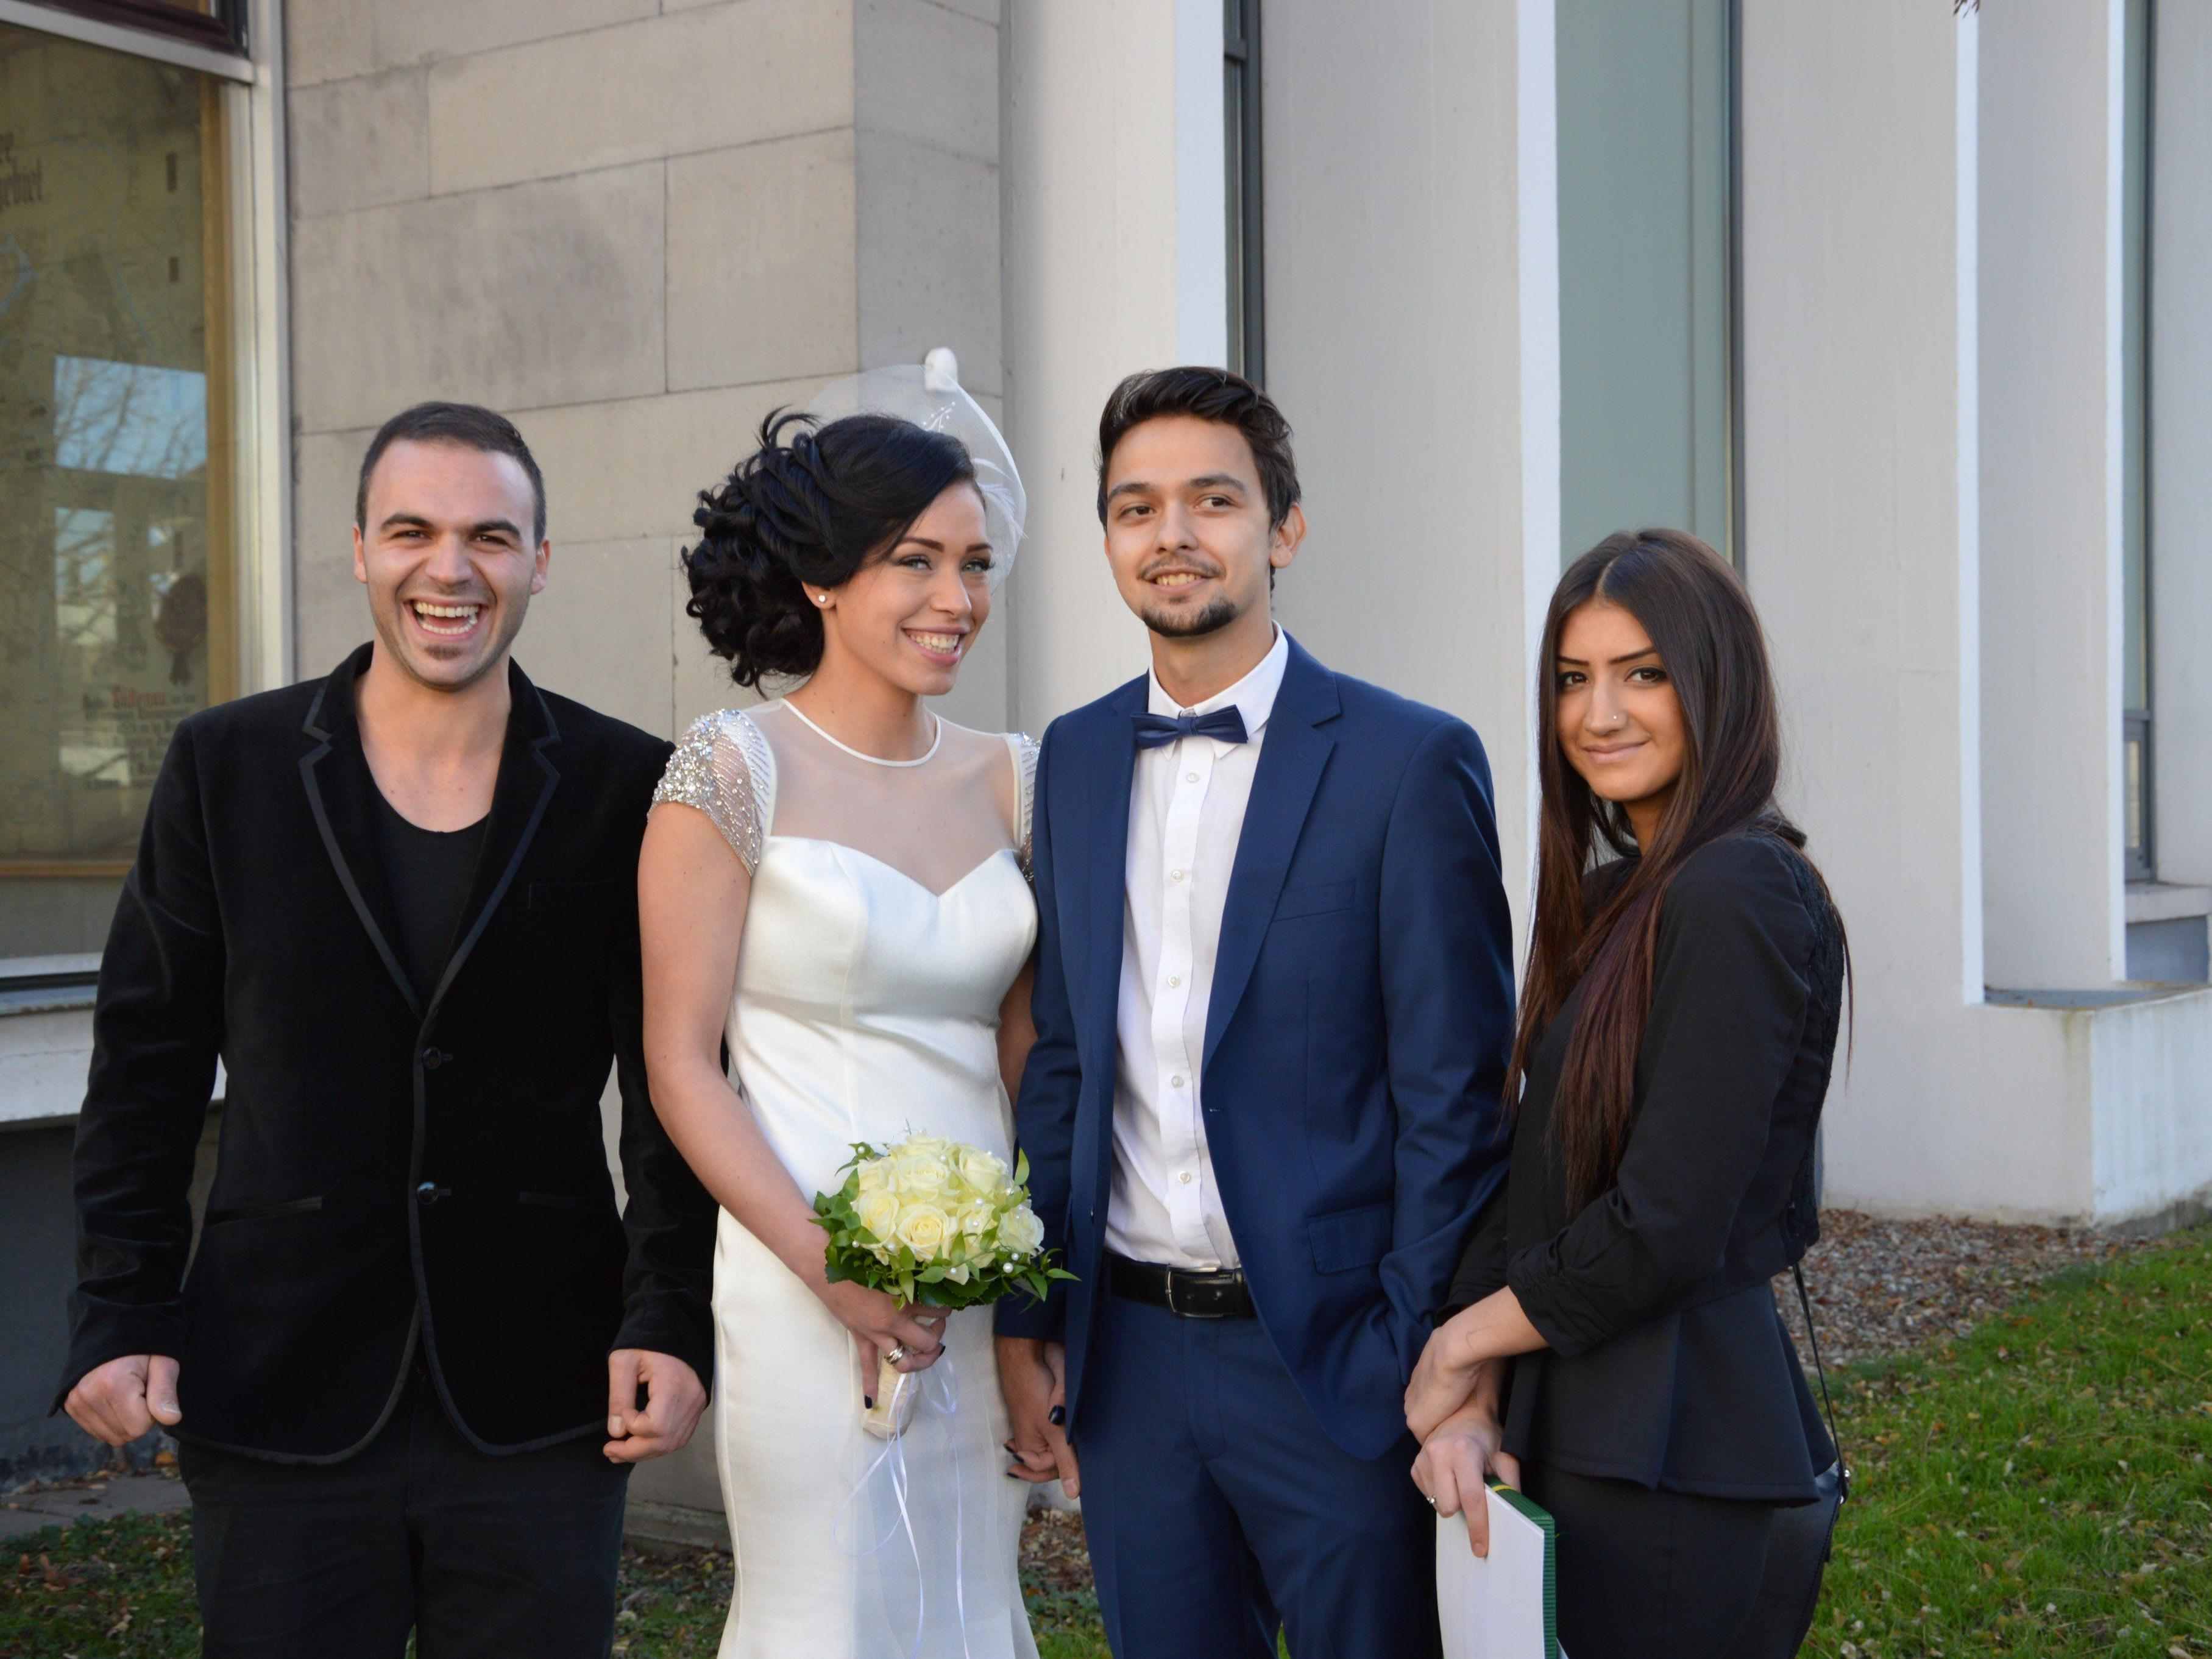 Sebile Demir und Osman Varoglu haben geheiratet